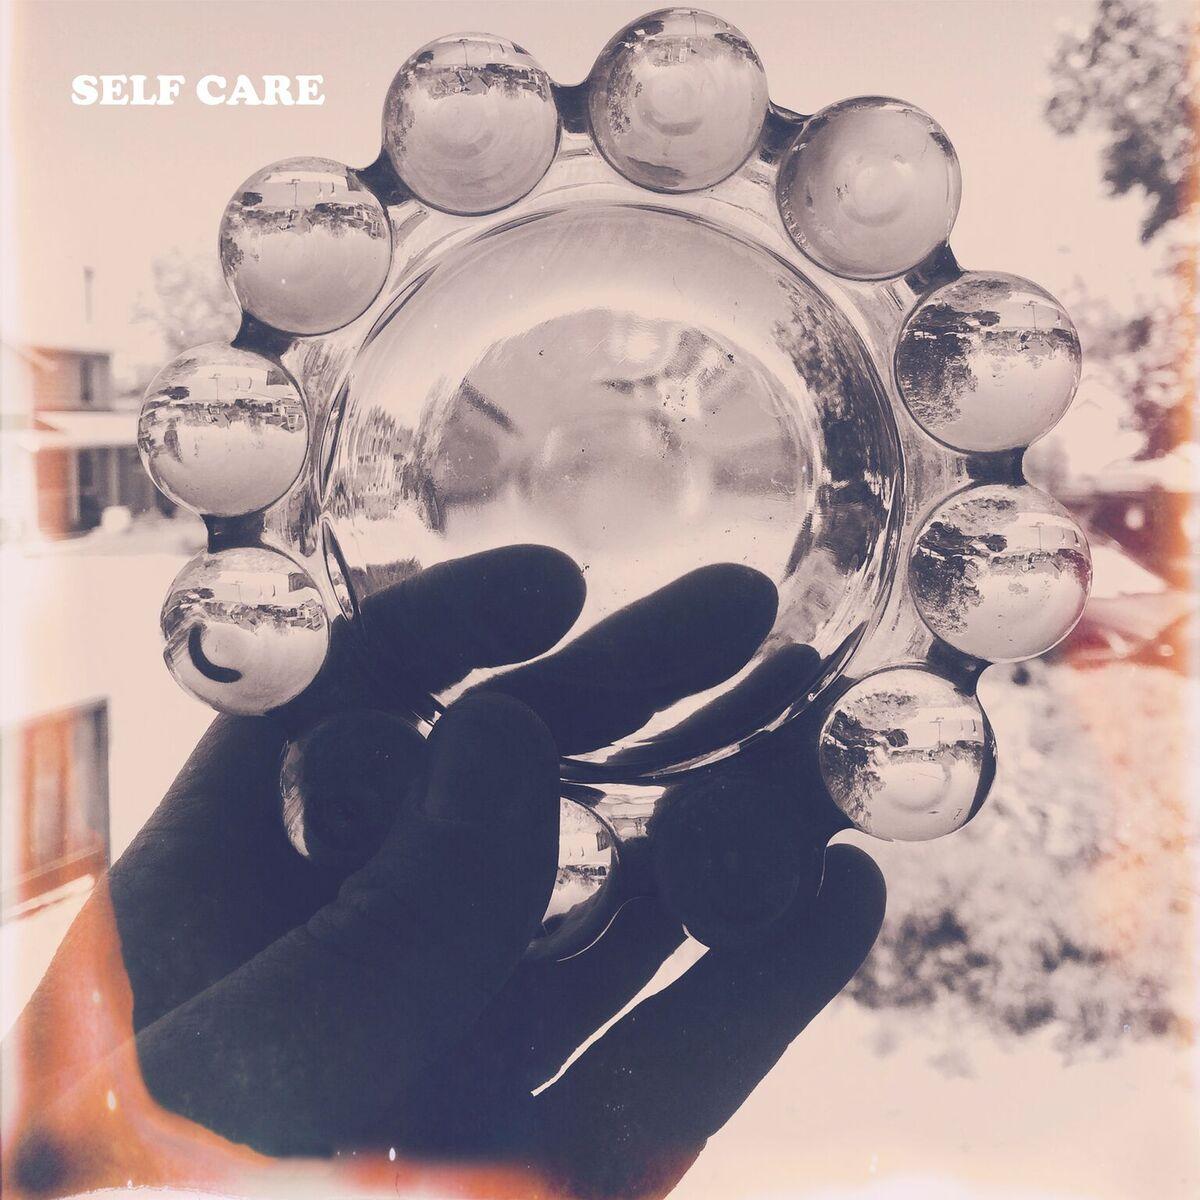 Self Care debut EP